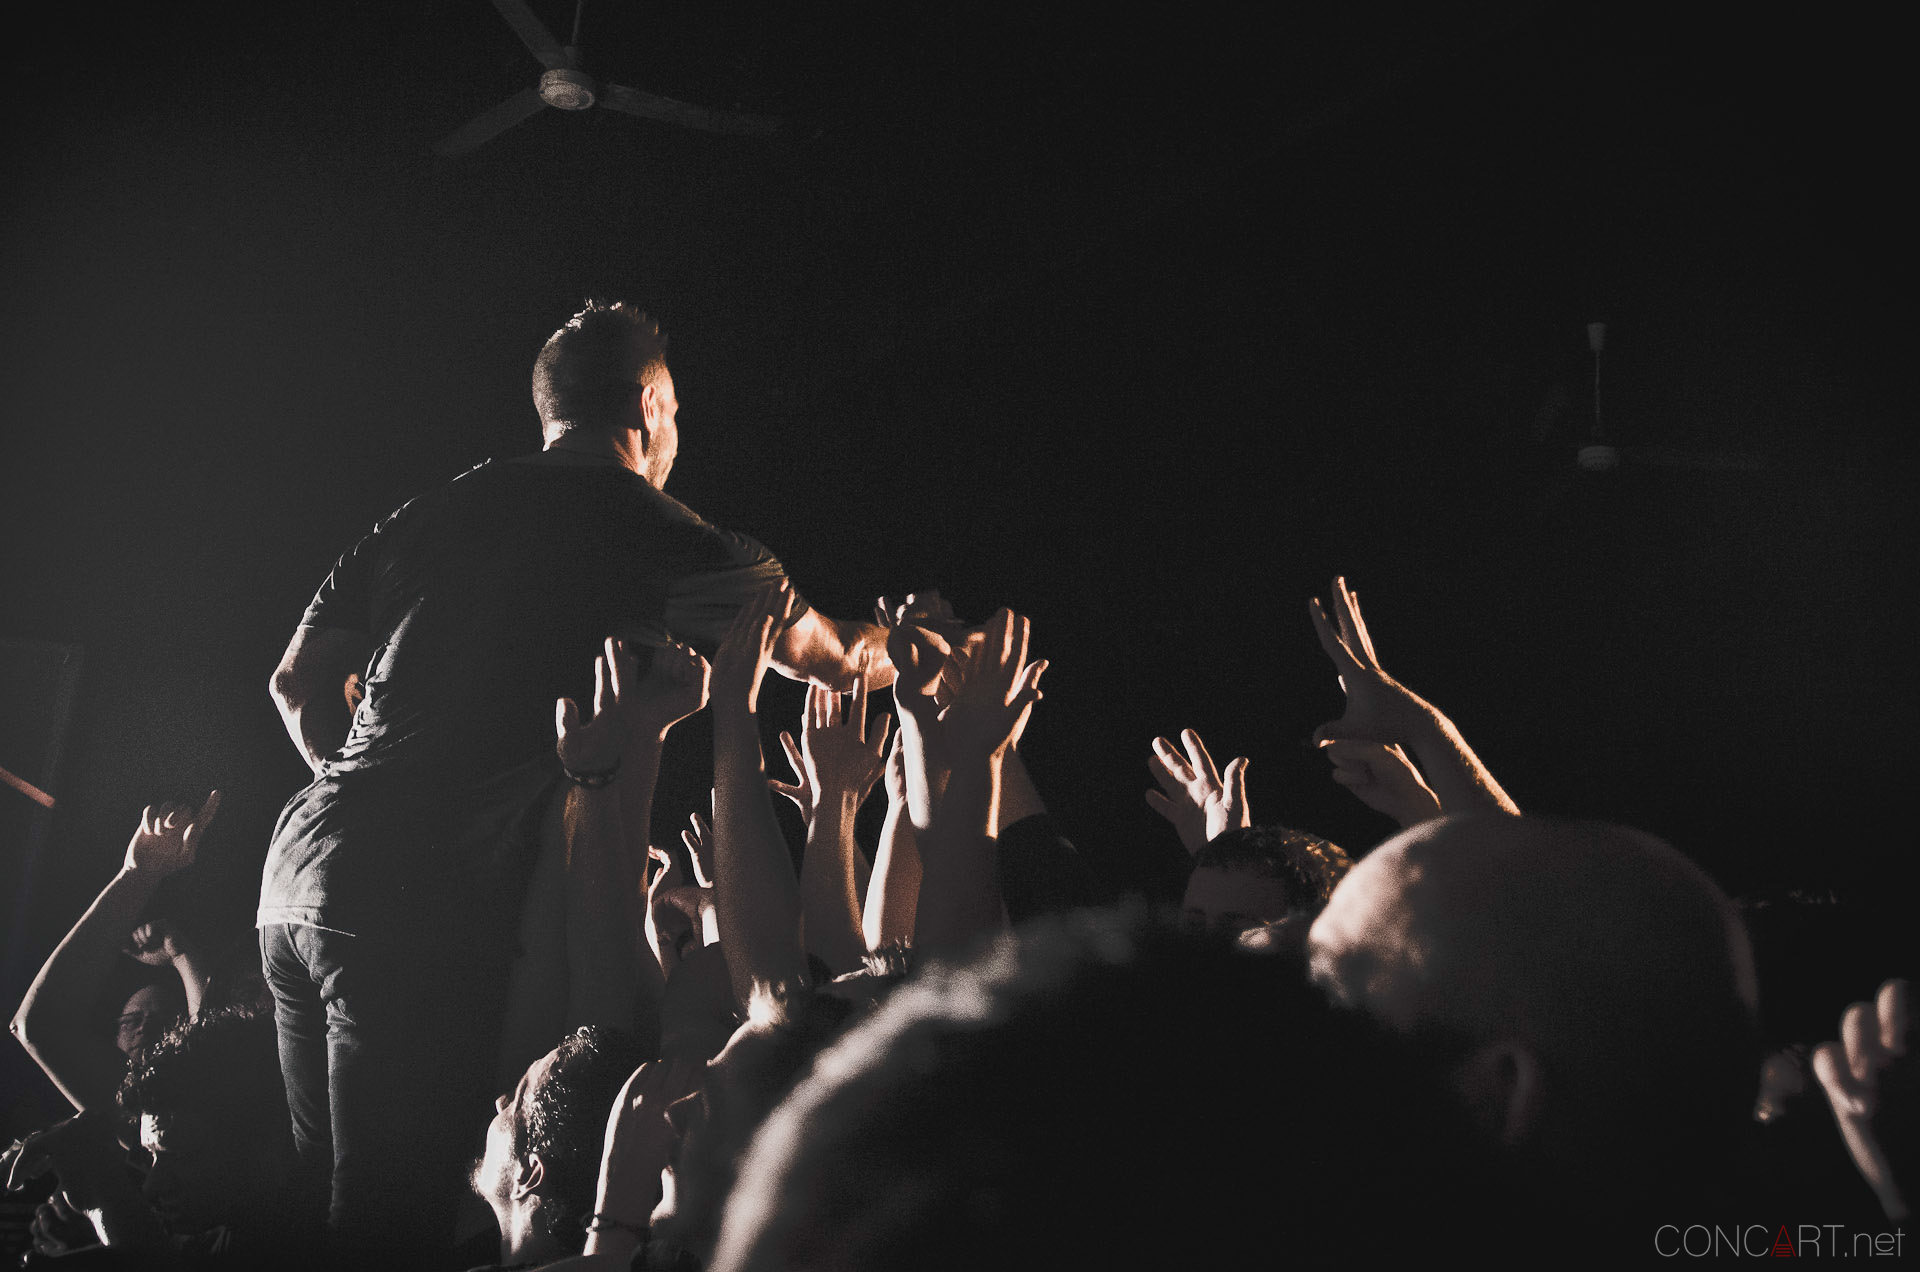 dillinger_escape_plan_live_emerson_theater_indianapolis_2013-15